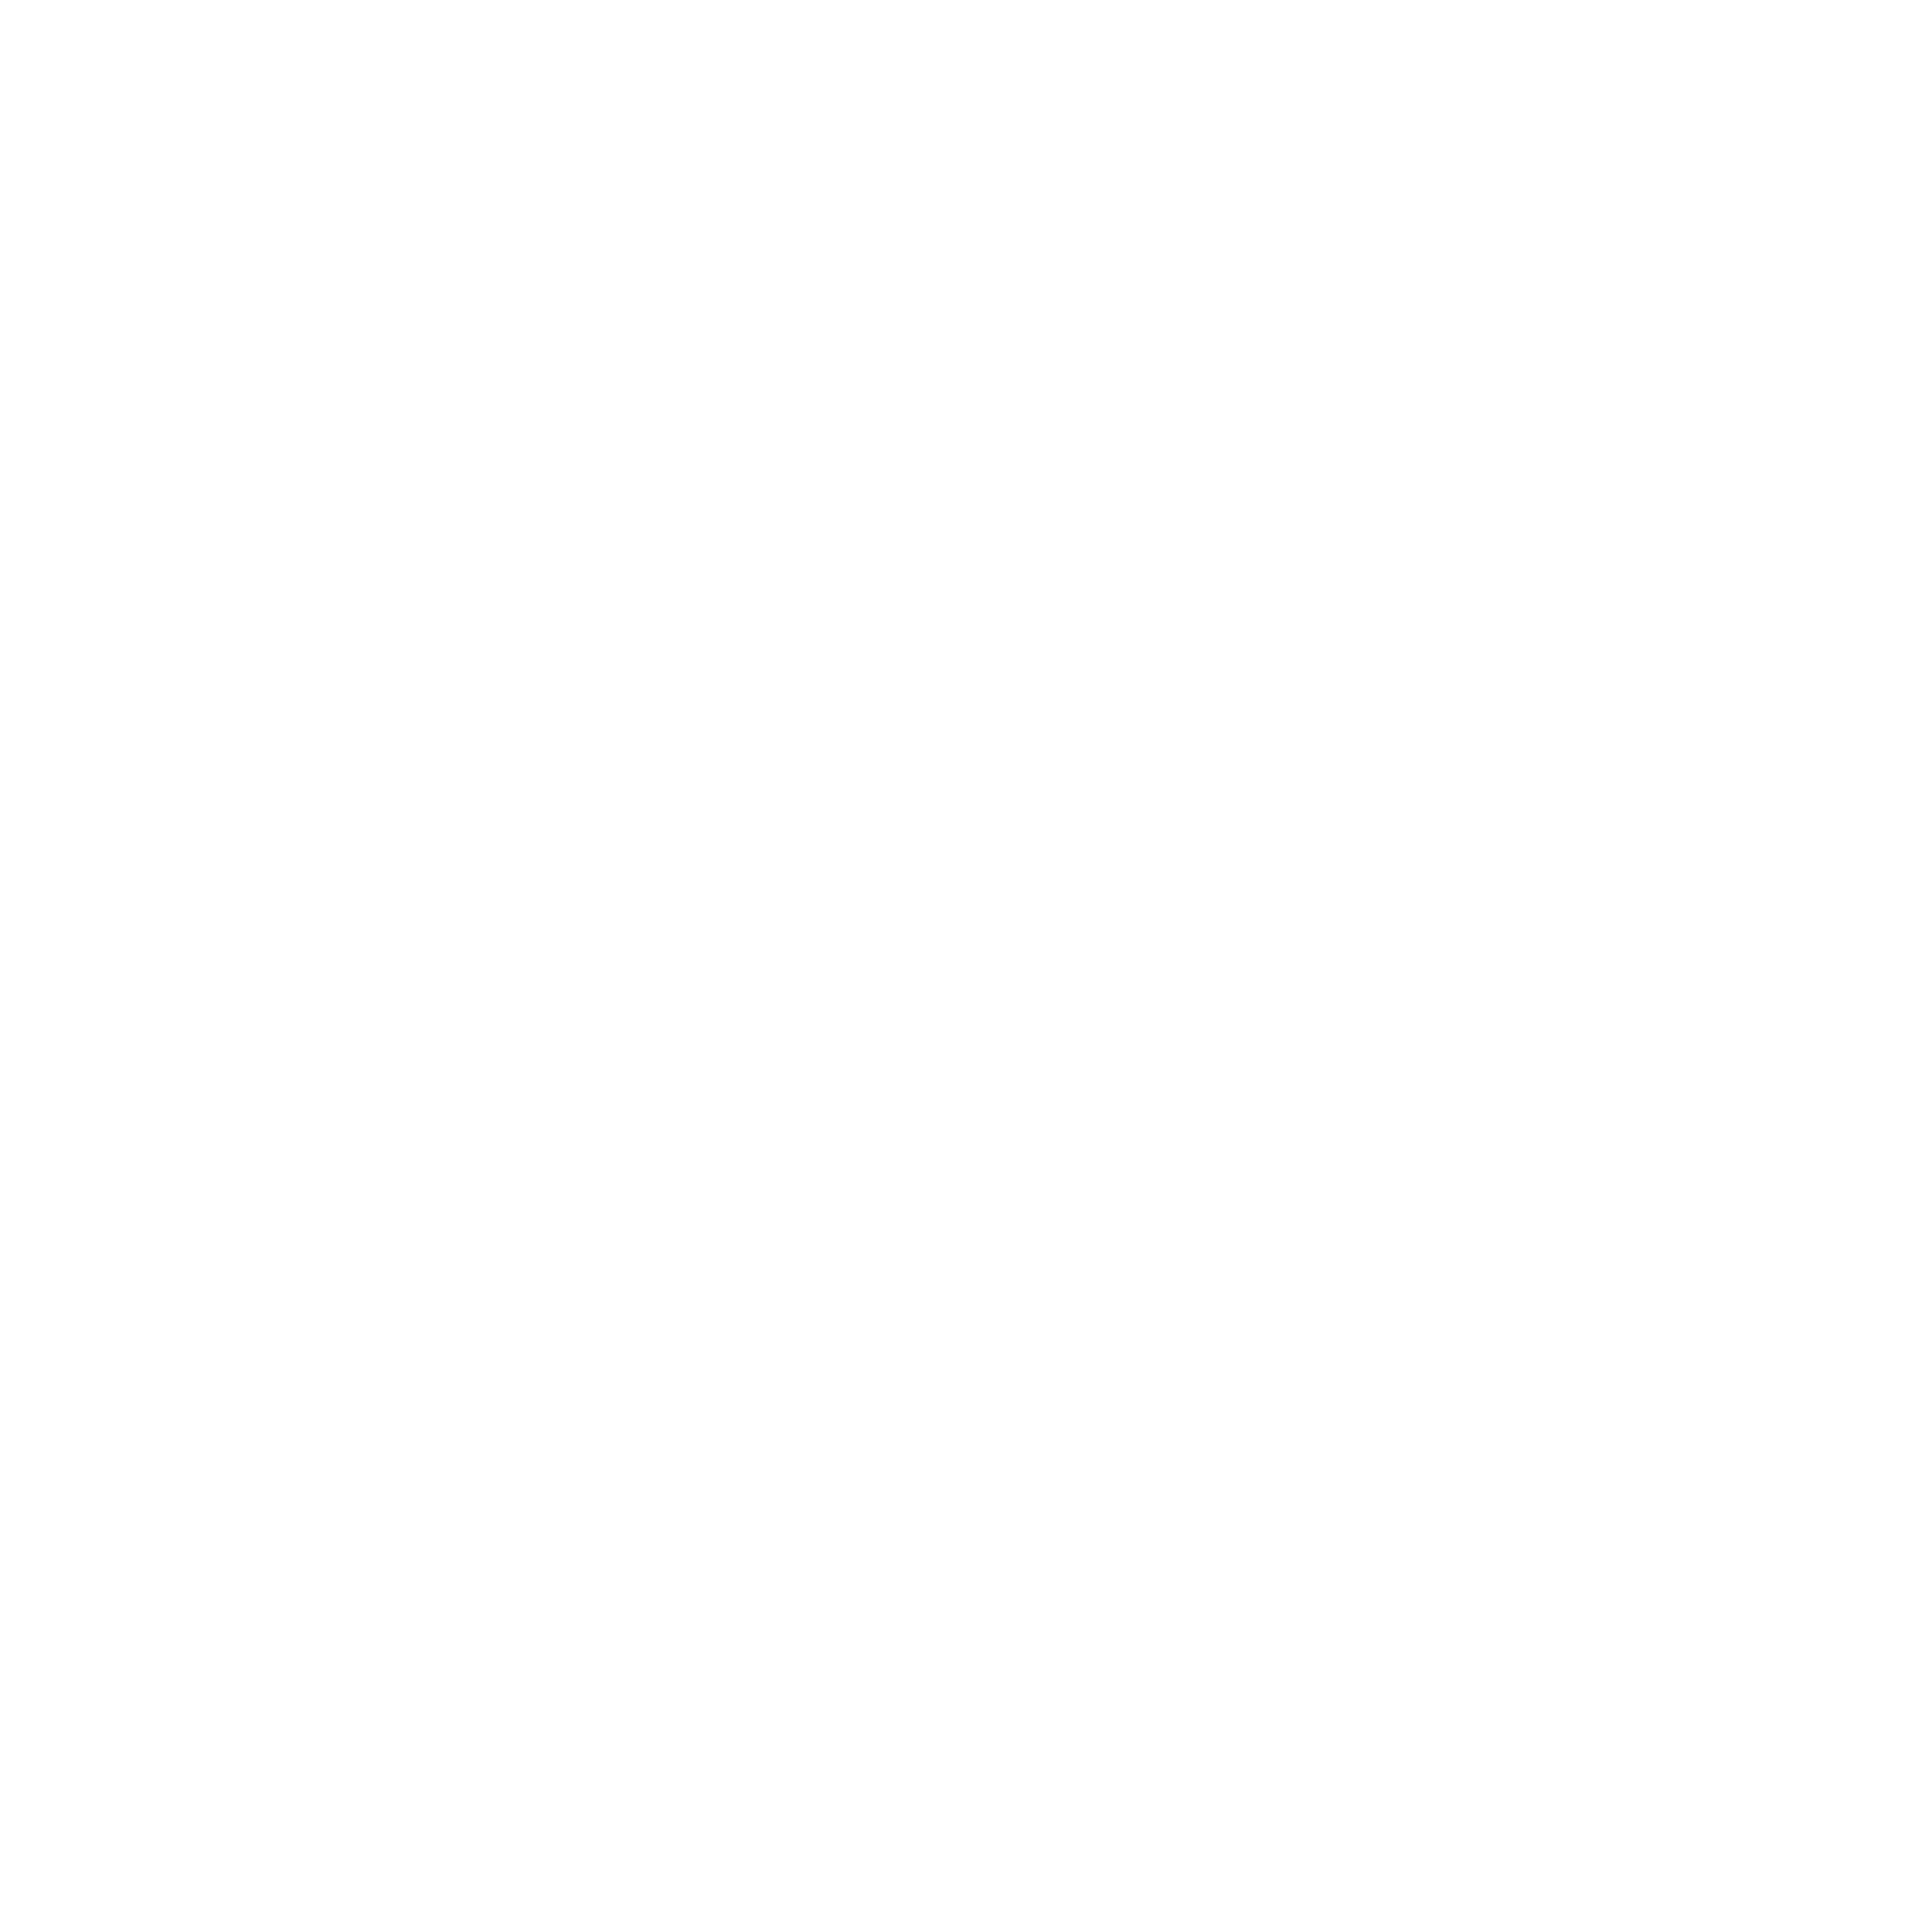 Flag 42 Studio